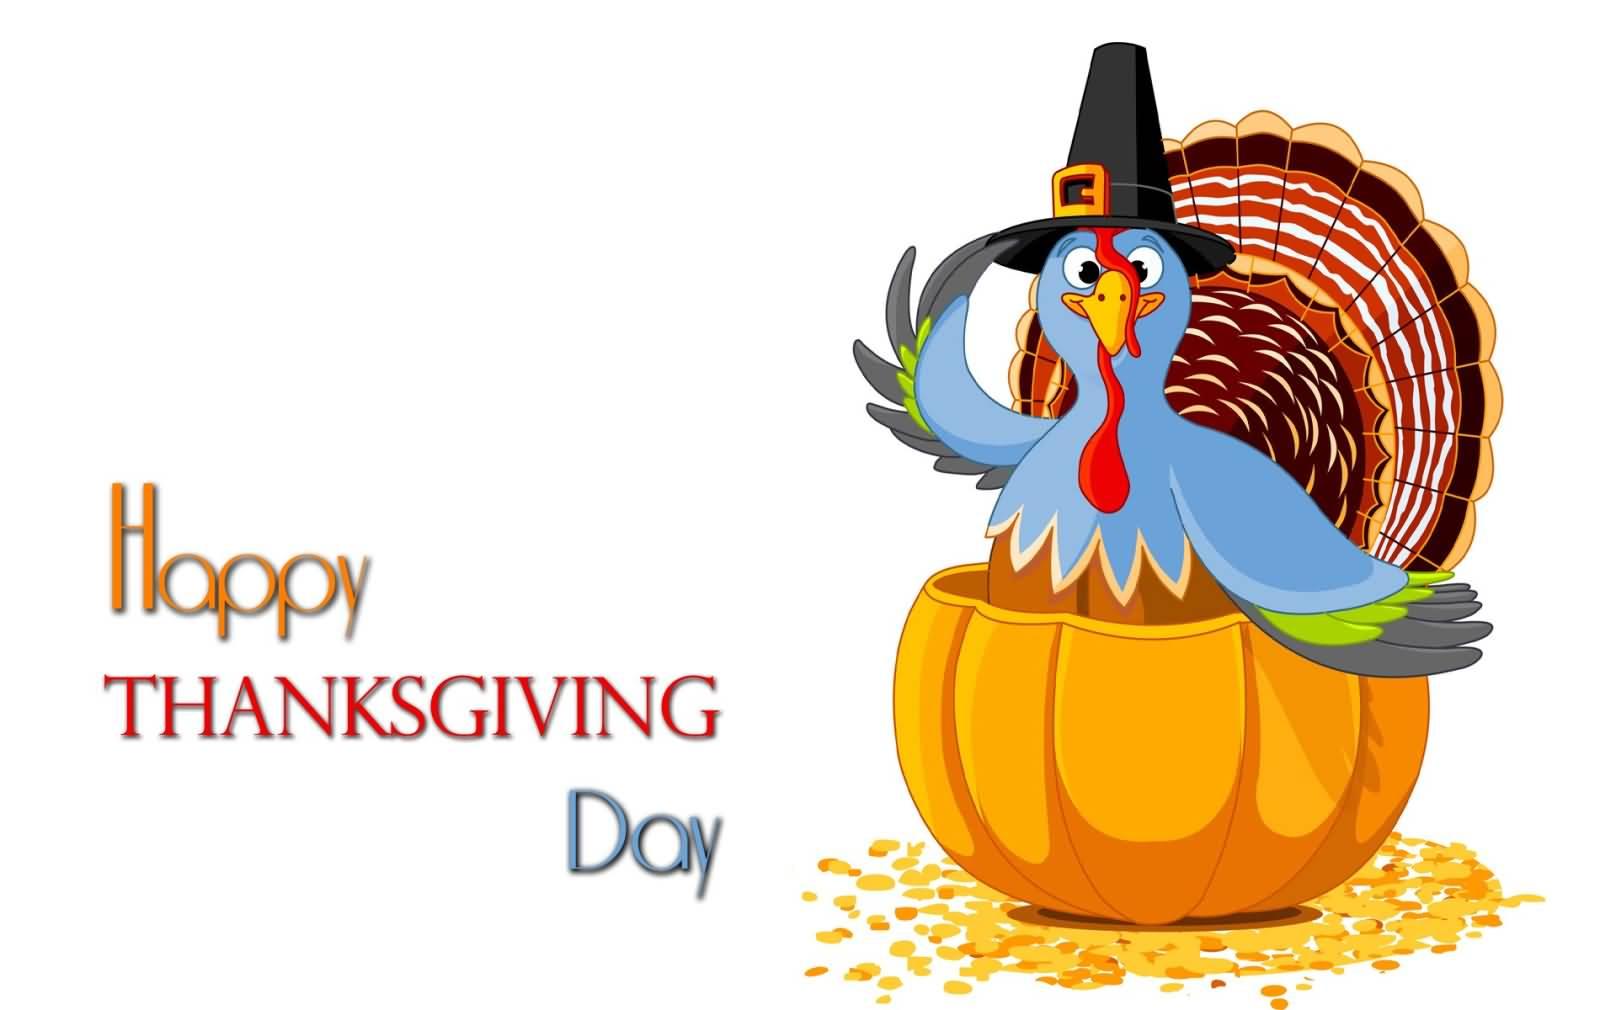 Happy Thanksgiving Day Turkey In Pumpkin Picture